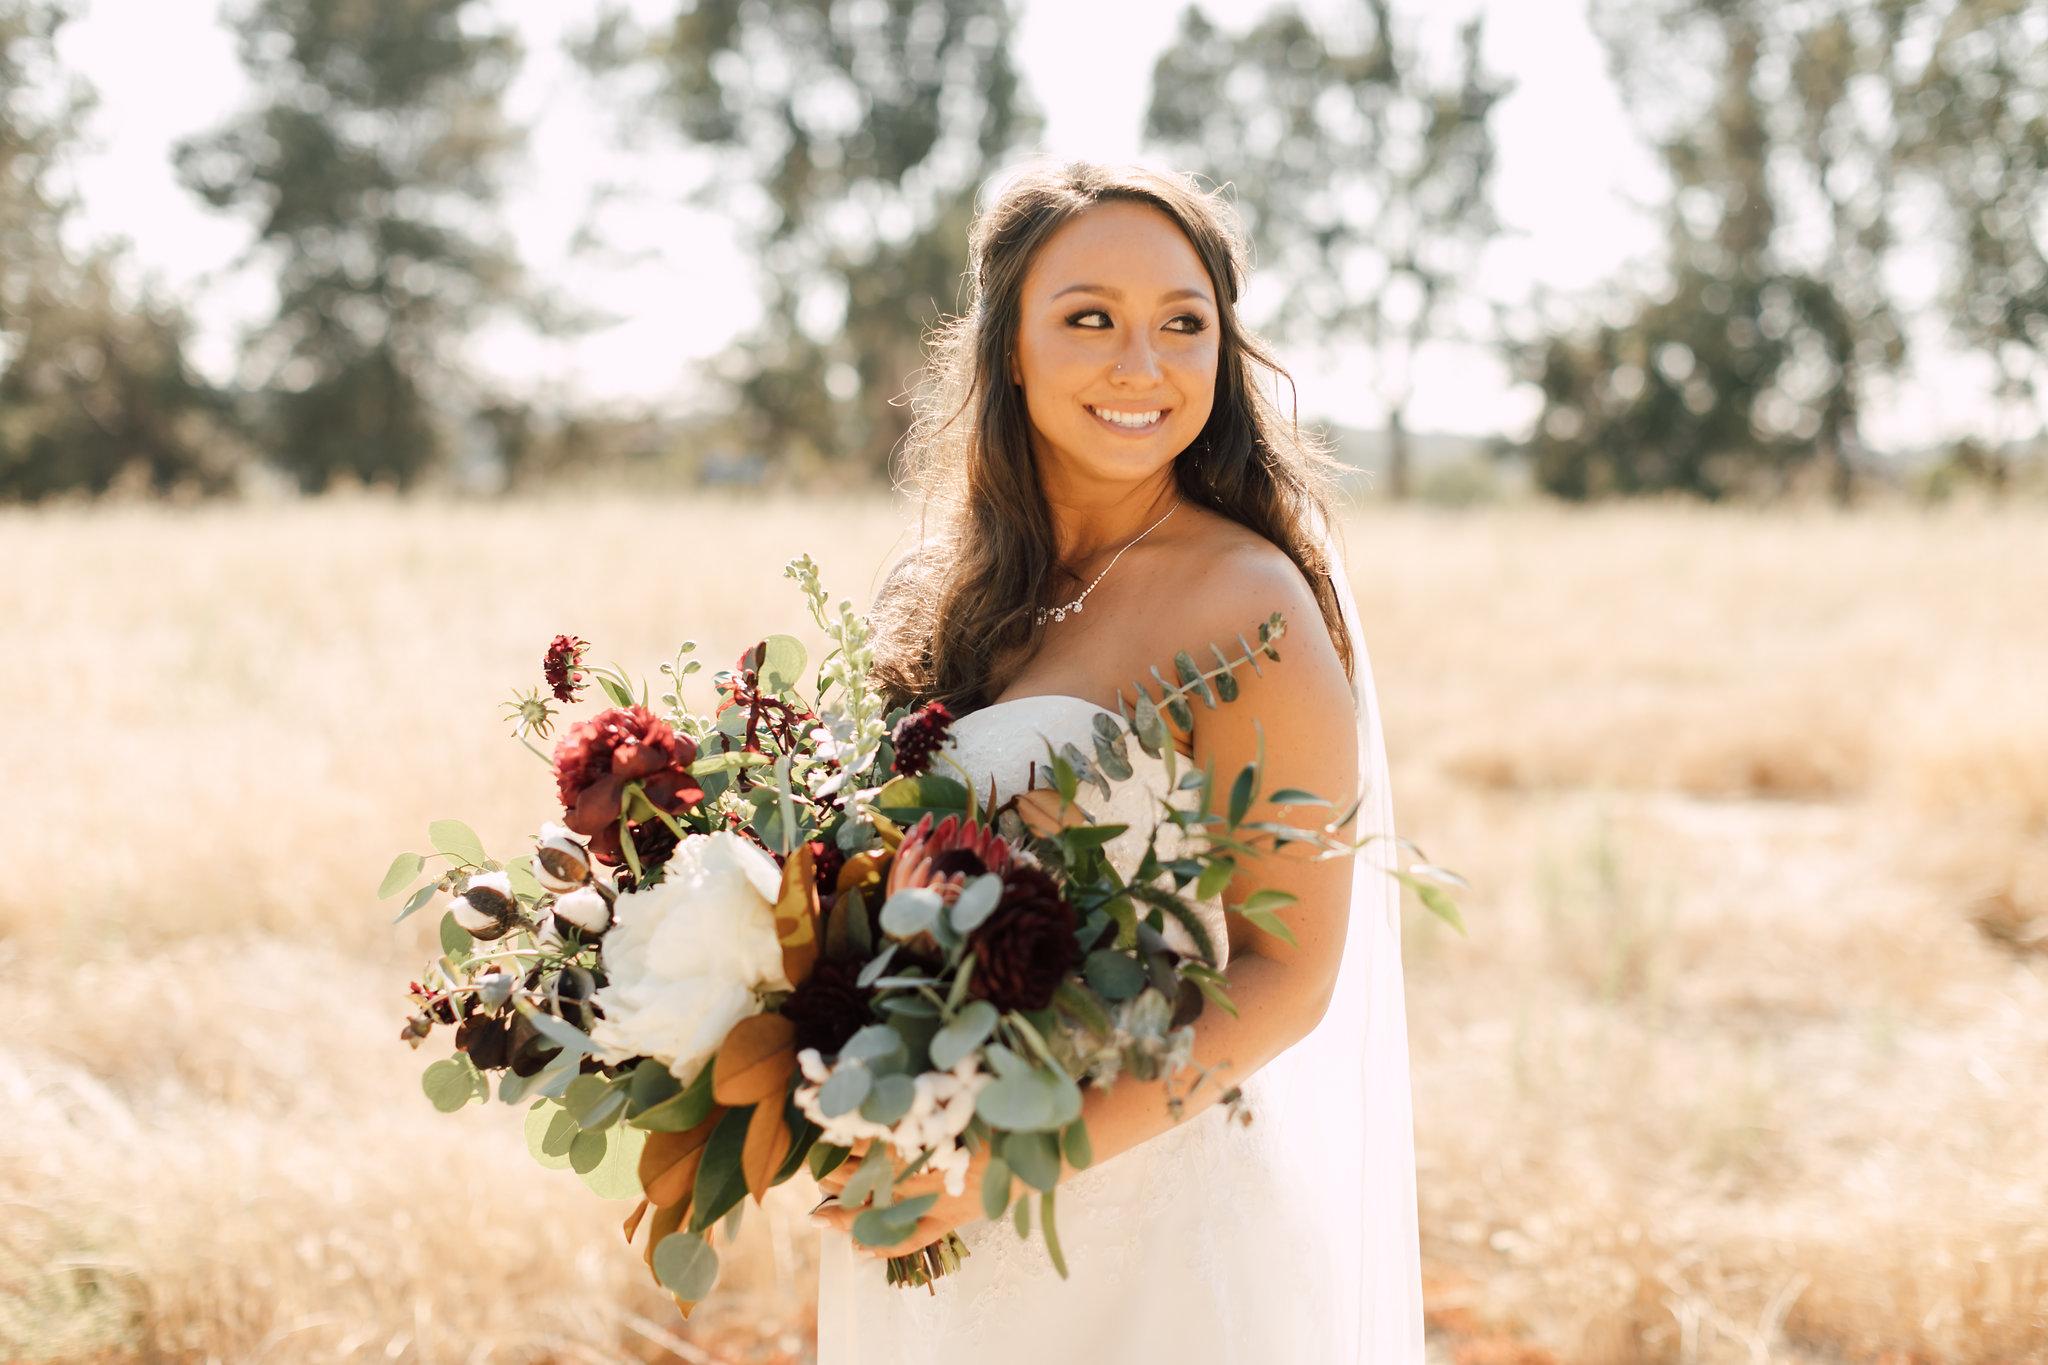 bridal bouquet 3.jpg